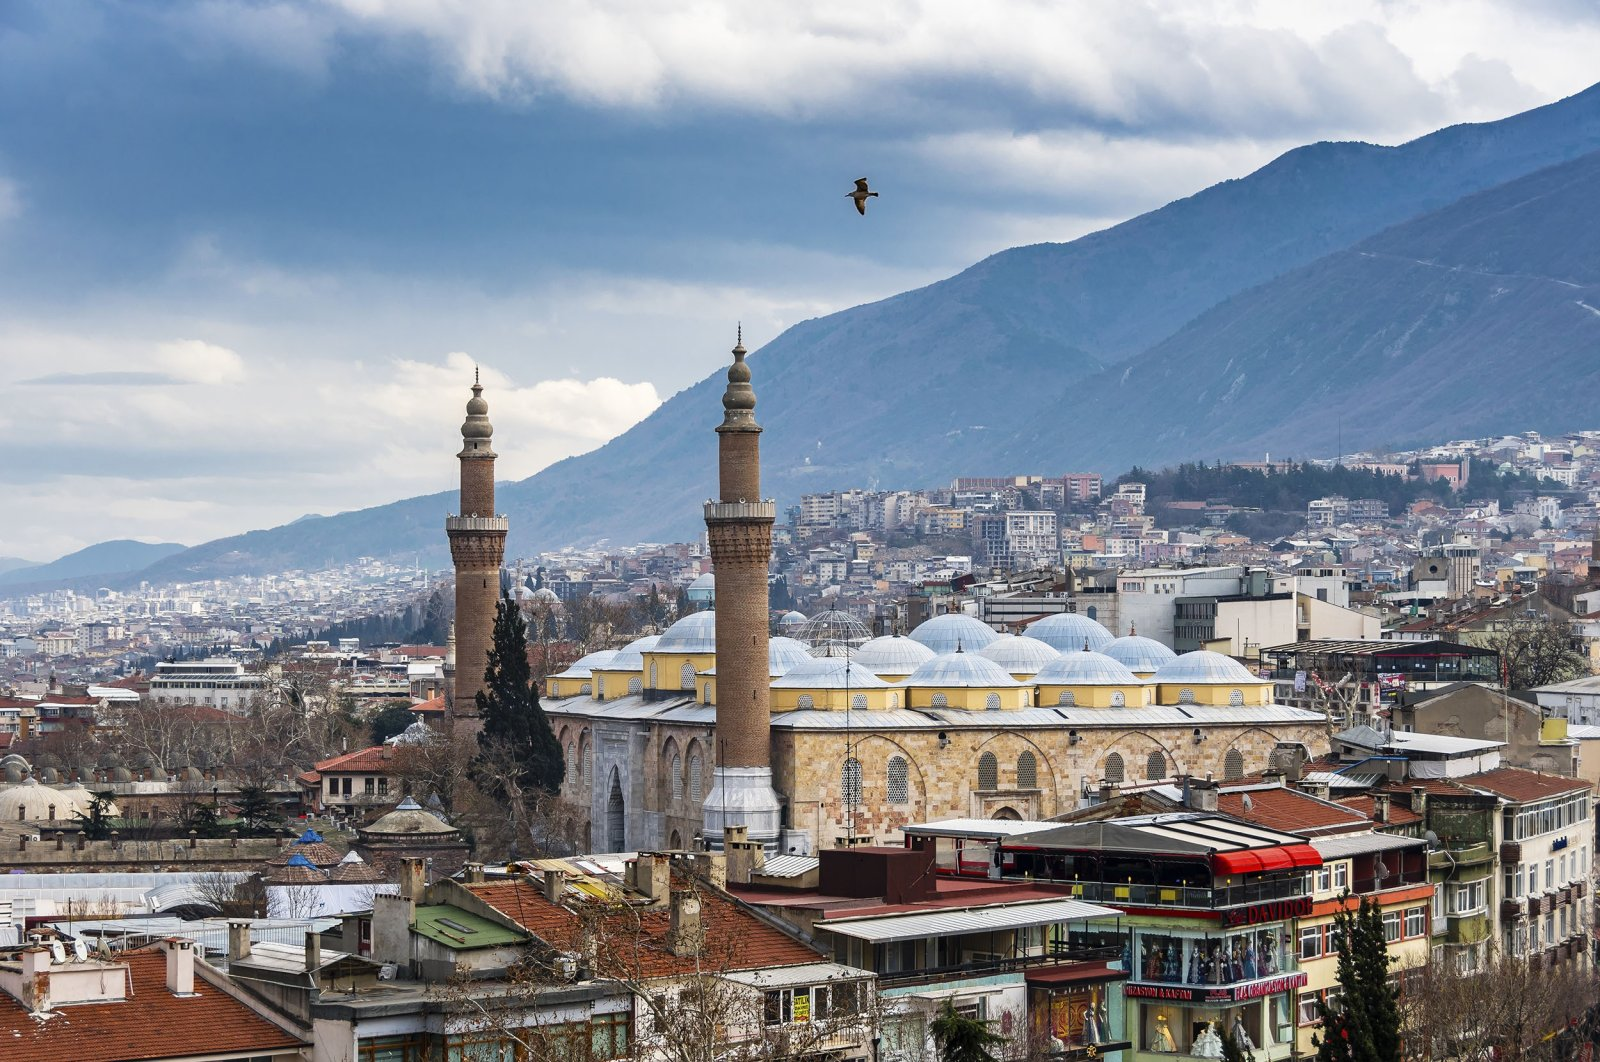 City view of Turkey's northwestern Bursa province from Bursa Castle, Dec. 30, 2017. (Shutterstock Photo)